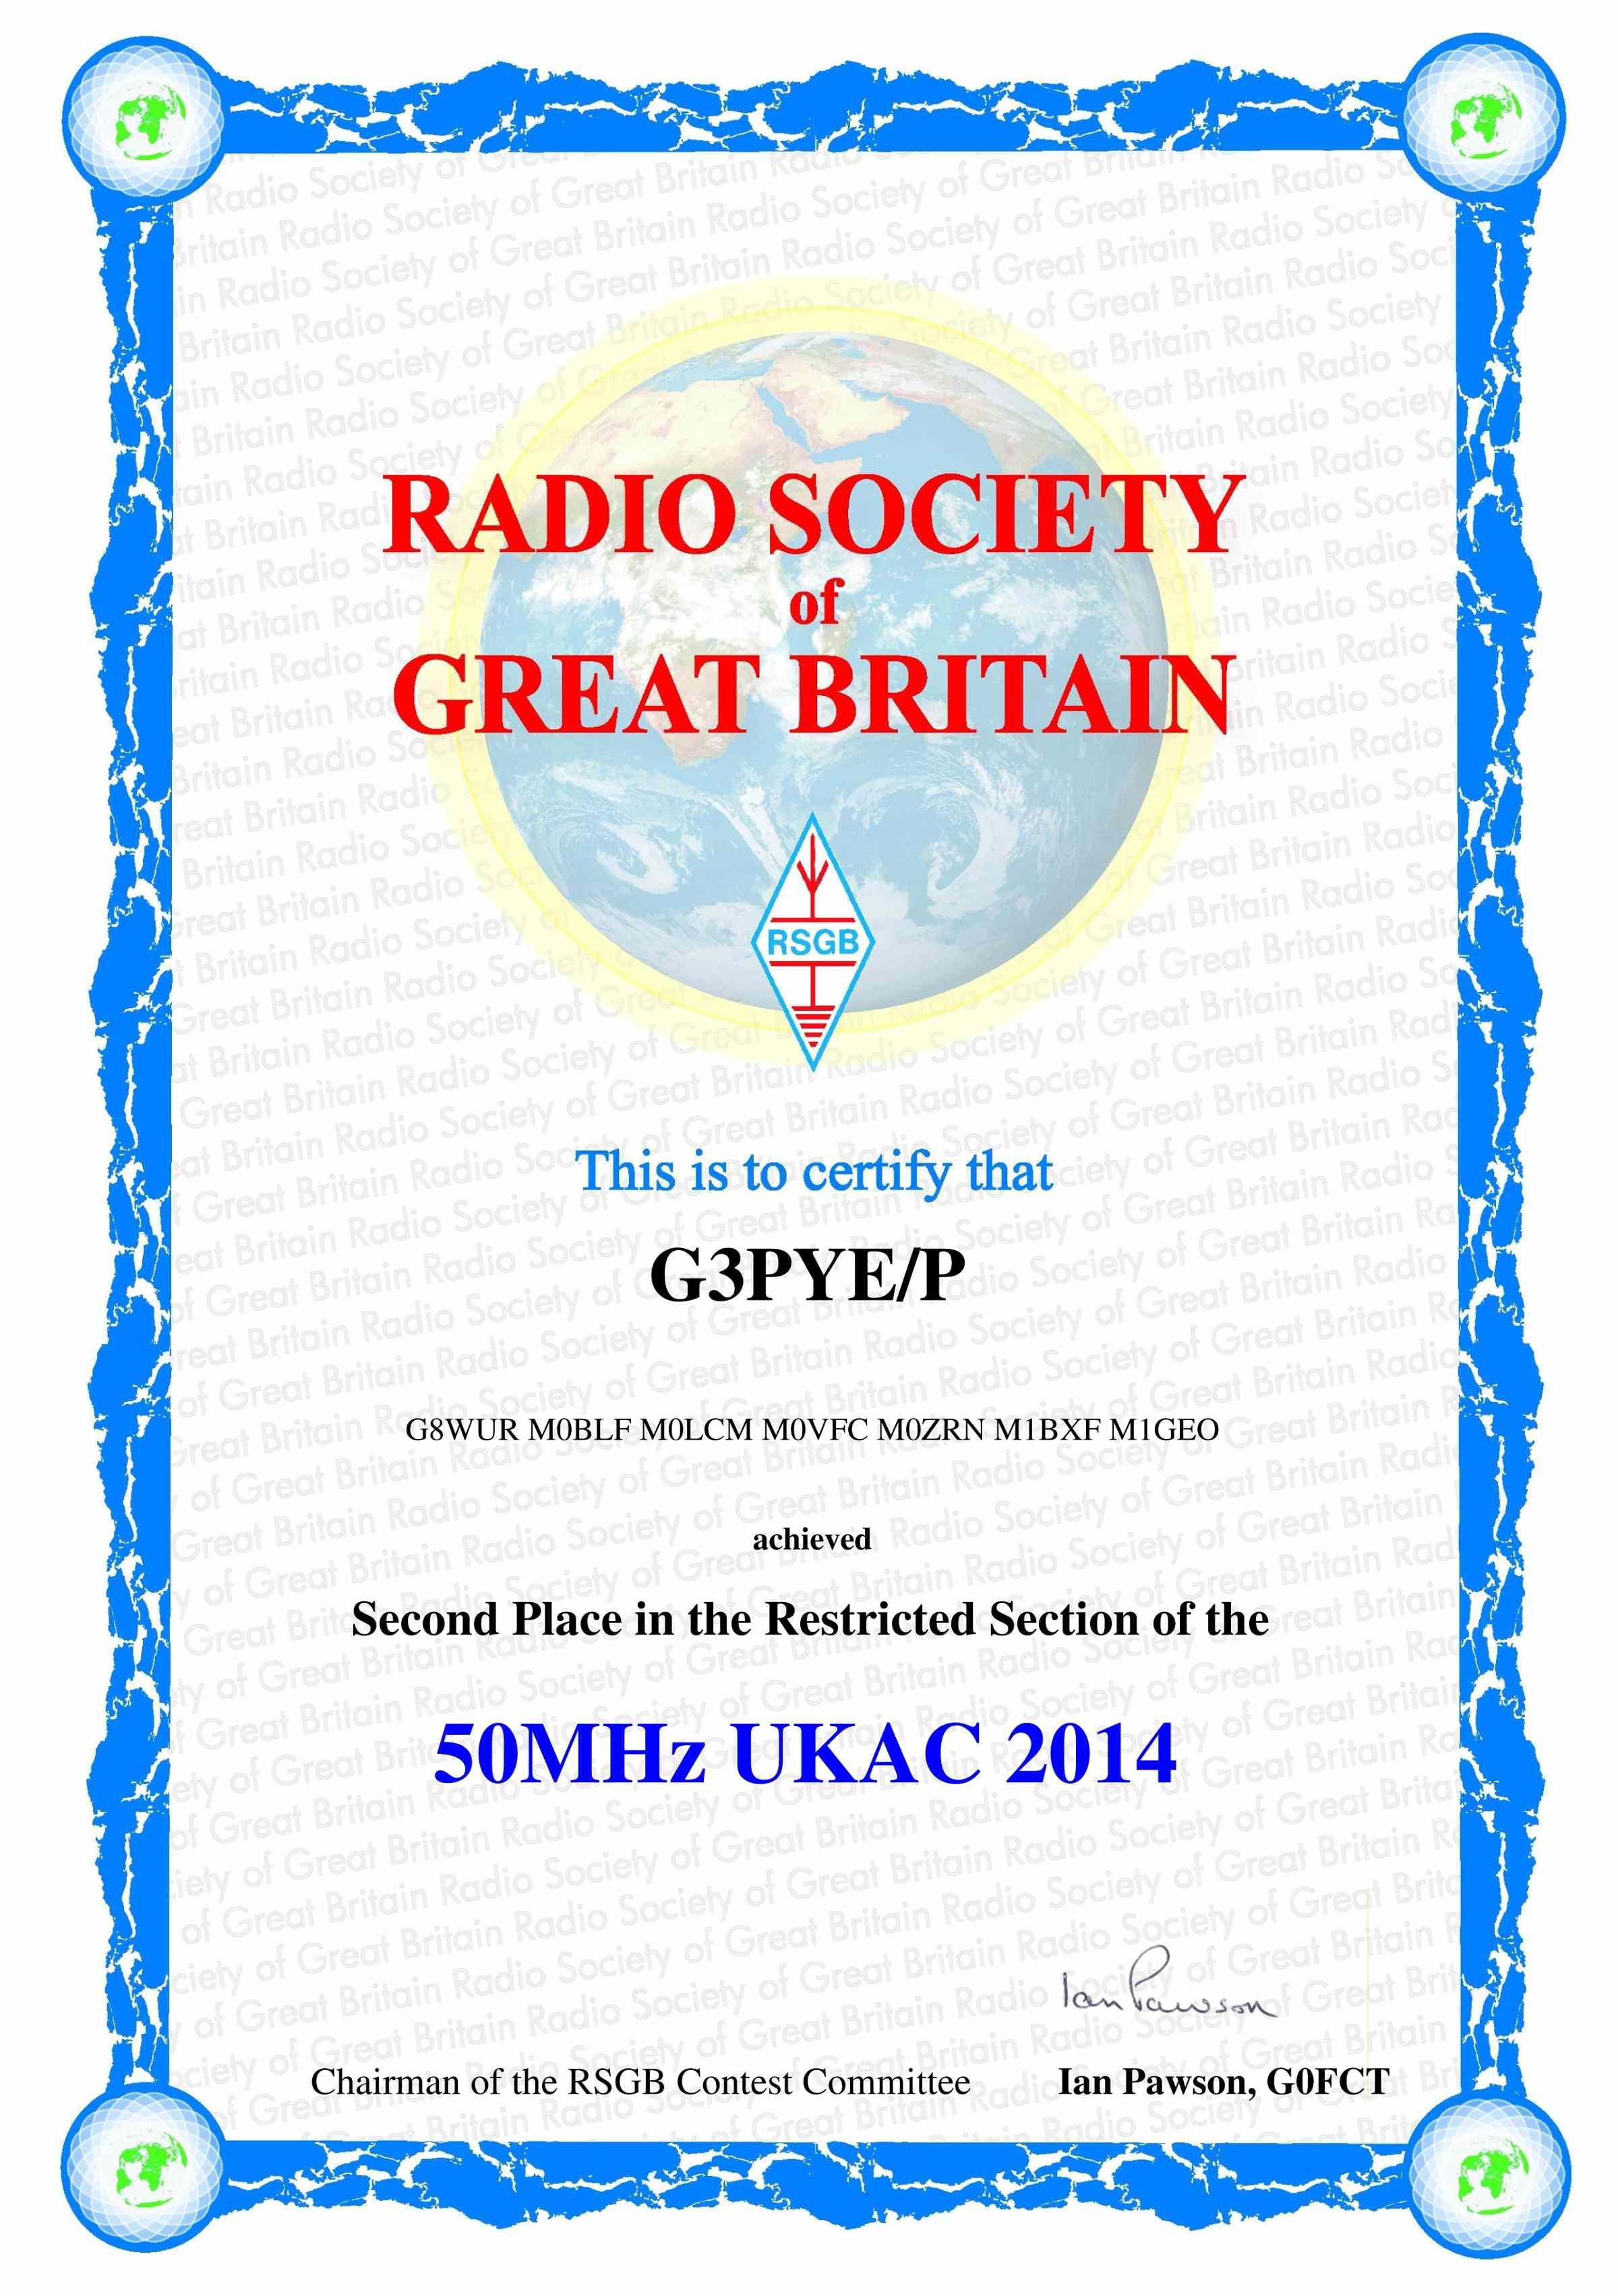 G3PYE/p 50 MHz UKAC 2014